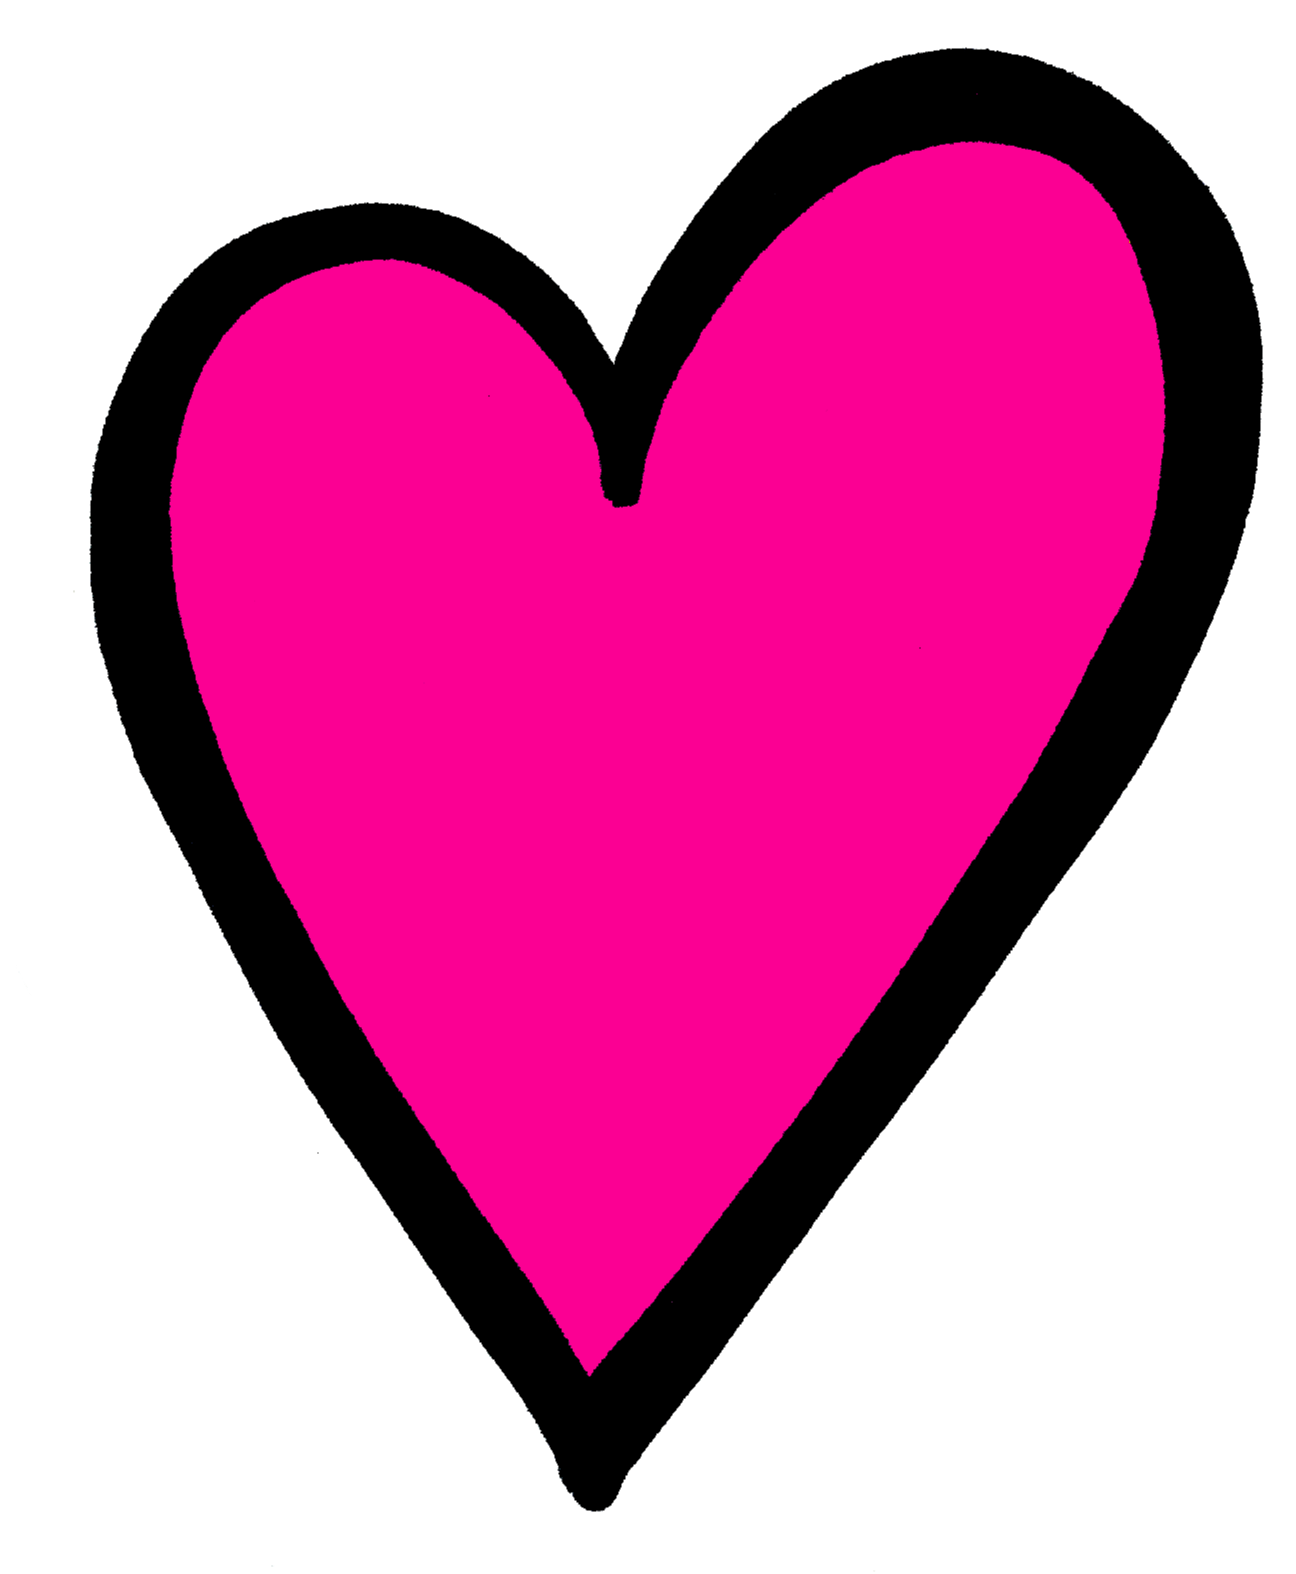 Download hot heart transparent. Pink hearts png